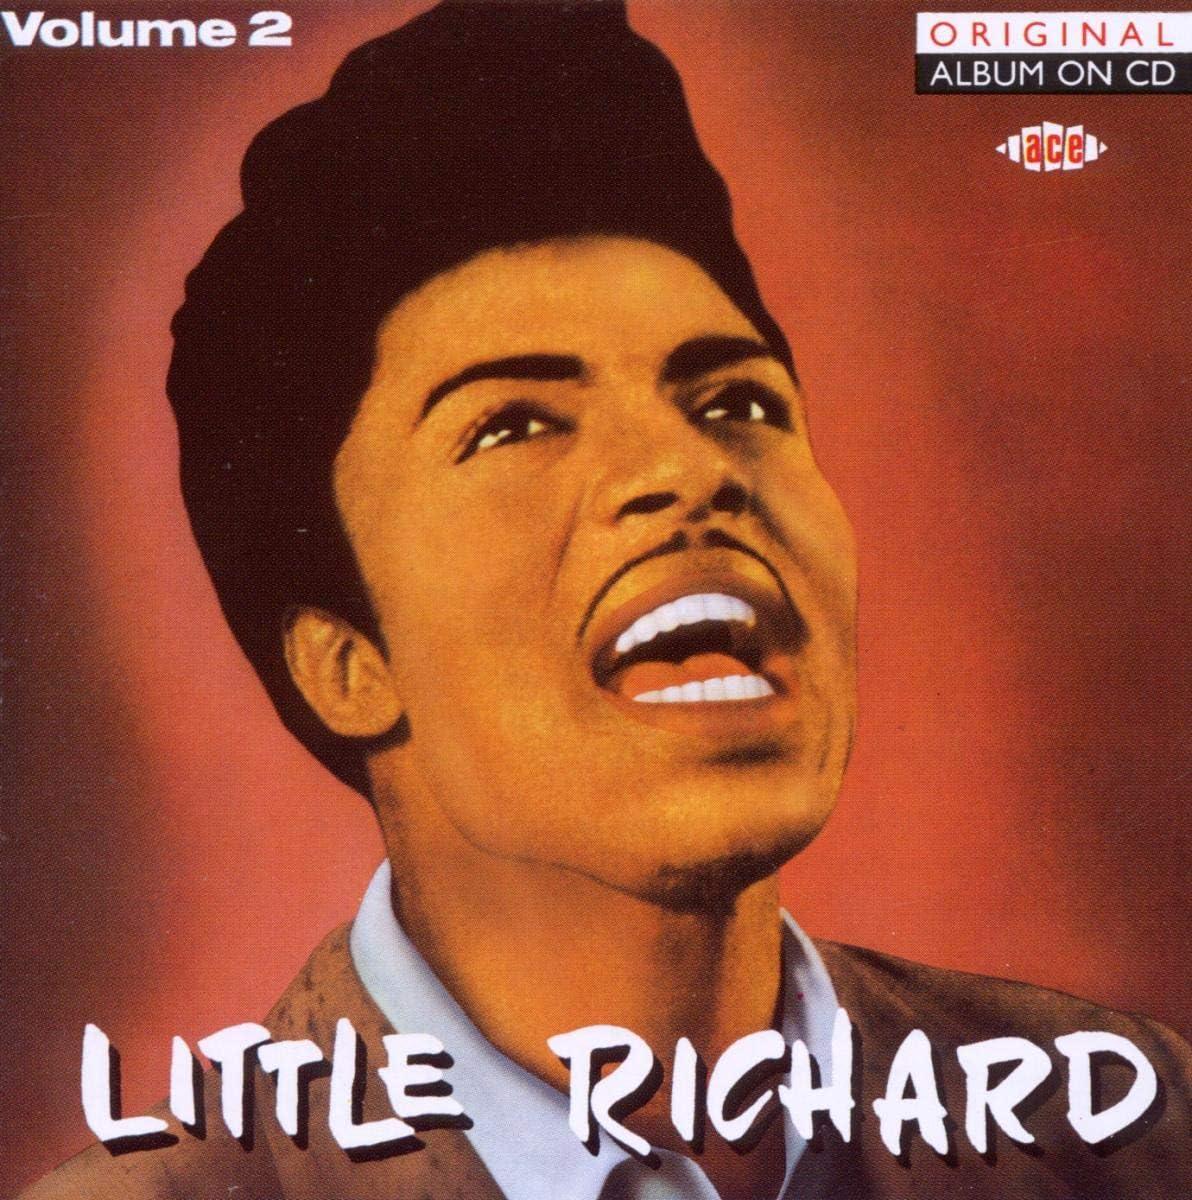 Amazon | Little Richard, Volume 2 | LITTLE RICHARD | 輸入盤 | 音楽